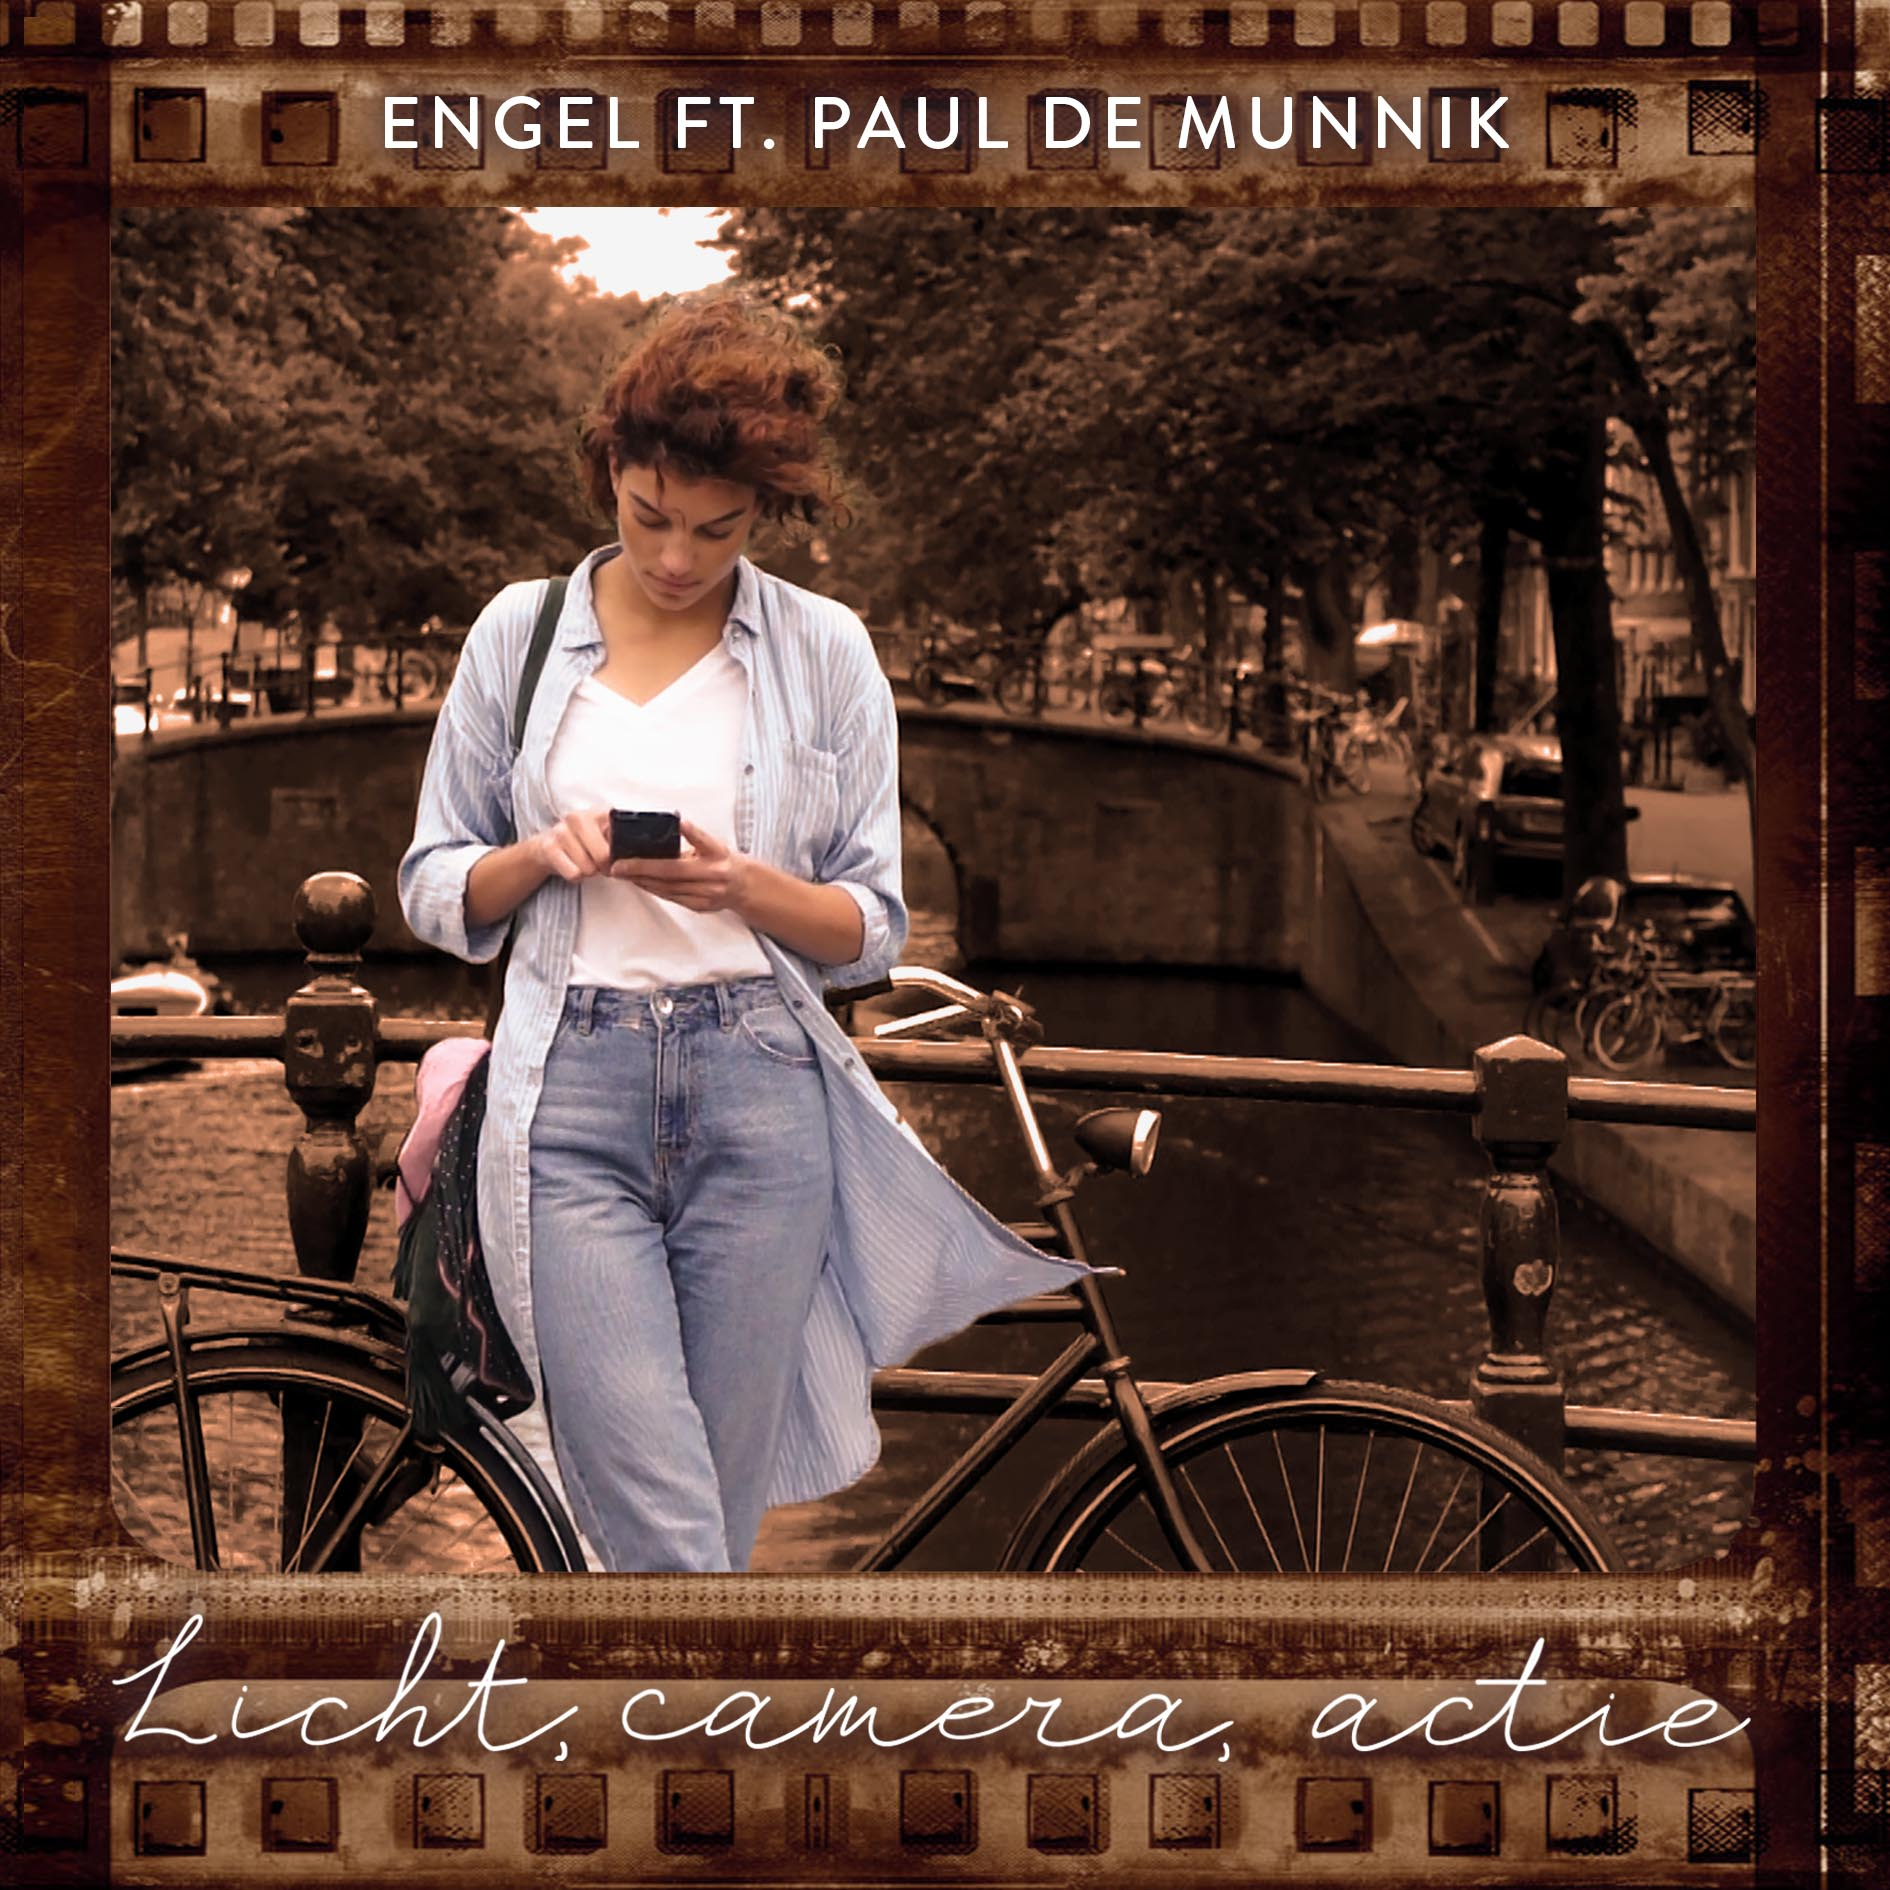 Licht, Camera, Actie ft. Paul de Munnik